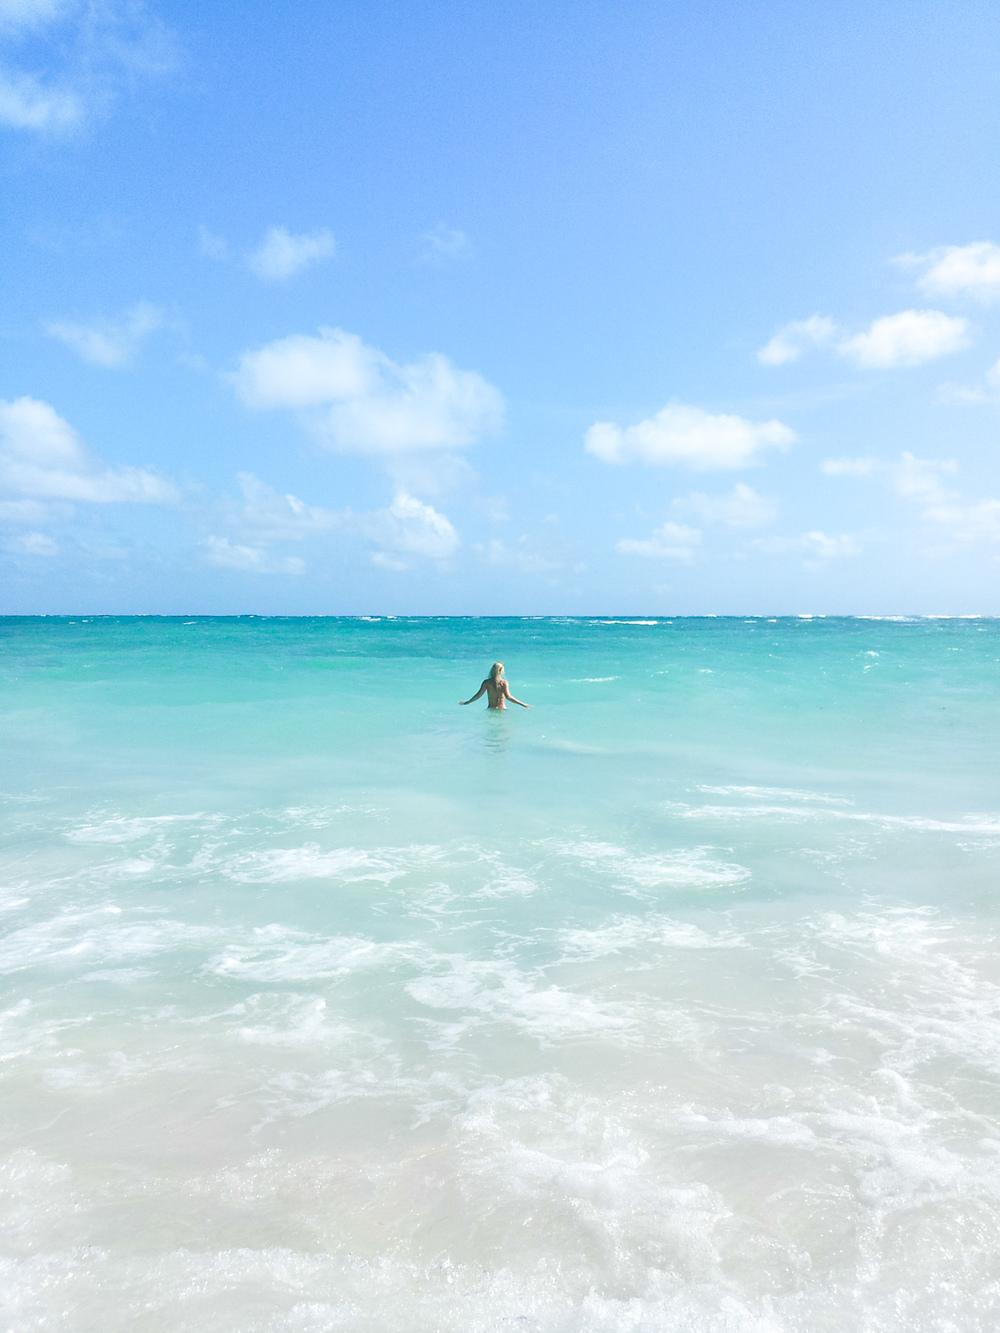 Christian-Schaffer-Caribbean-Dominican-Republic-Punta-Cana-Beach.jpg